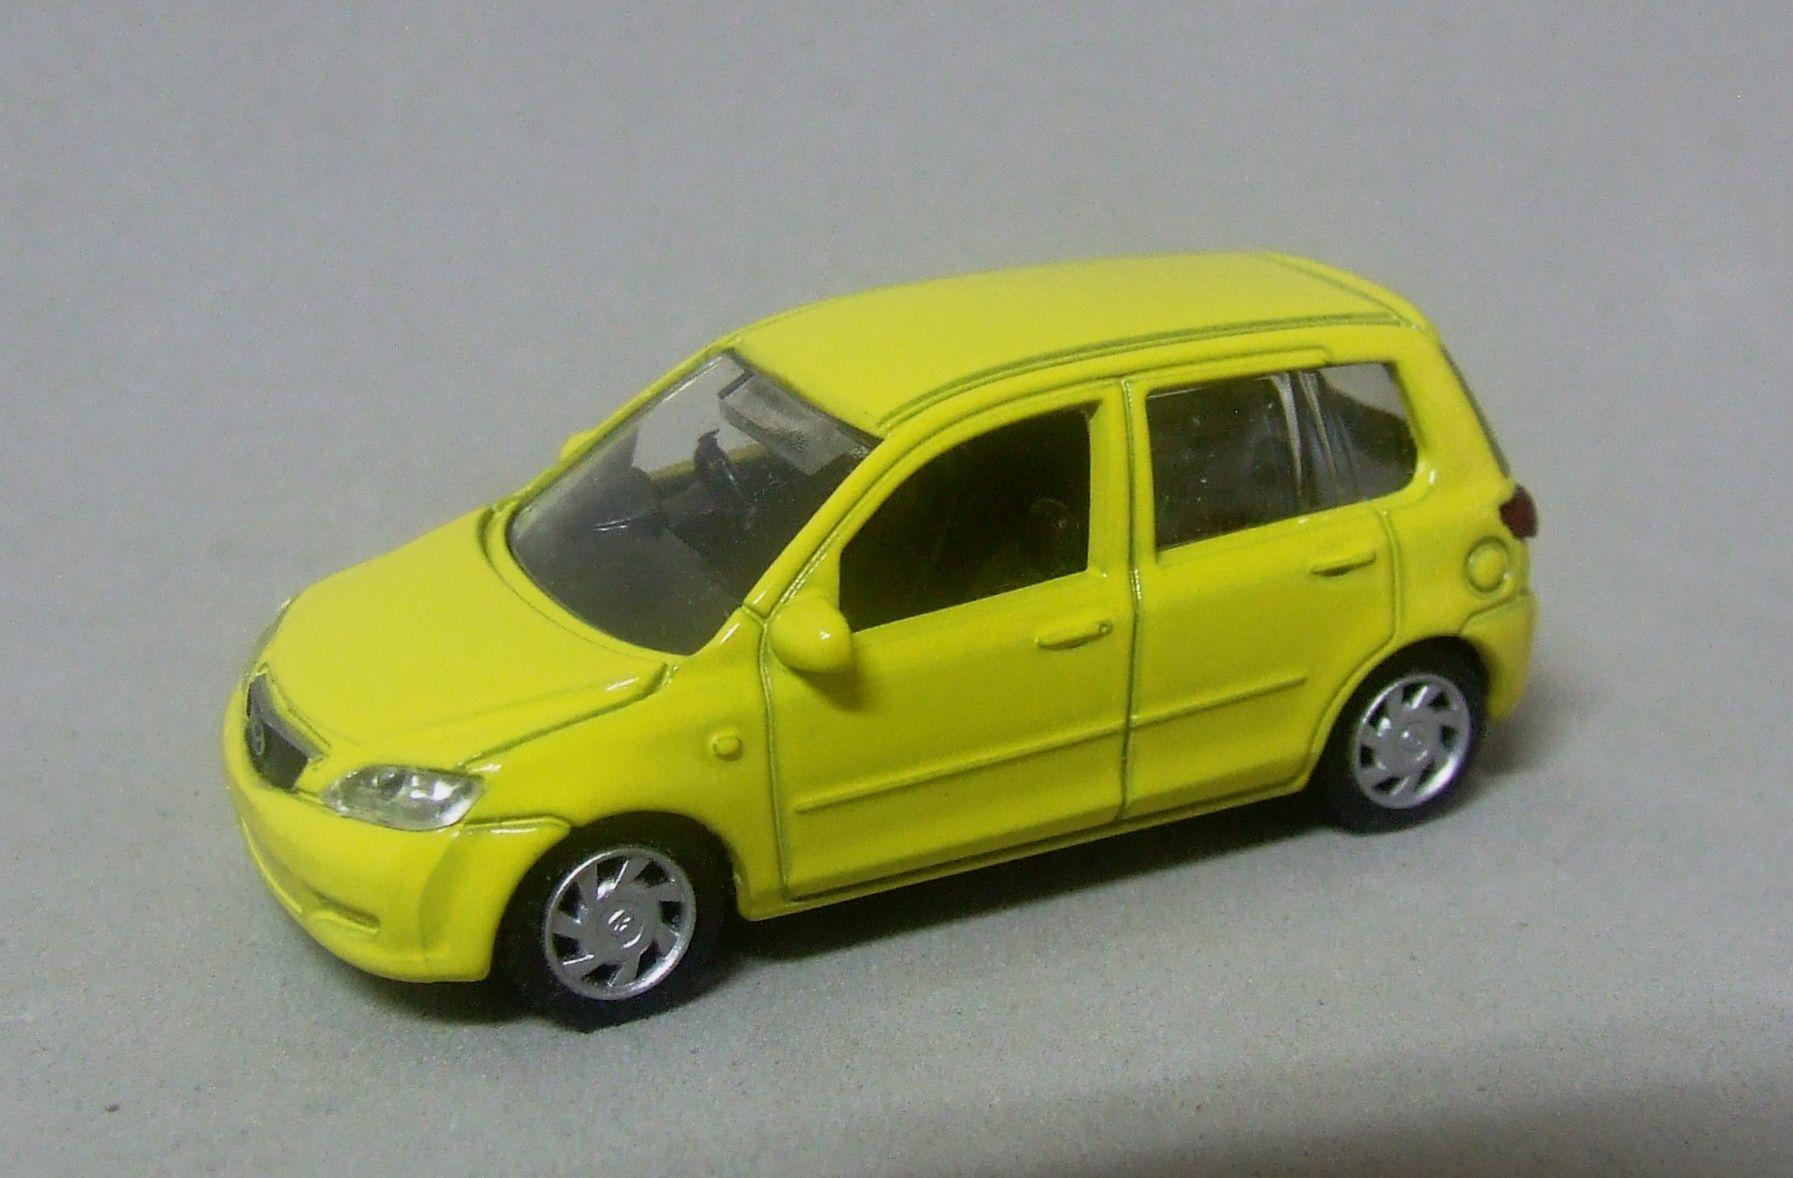 Mazda Demio 1 72 Scale By Epoch In 2020 Mazda Diecast Models Diecast Model Cars